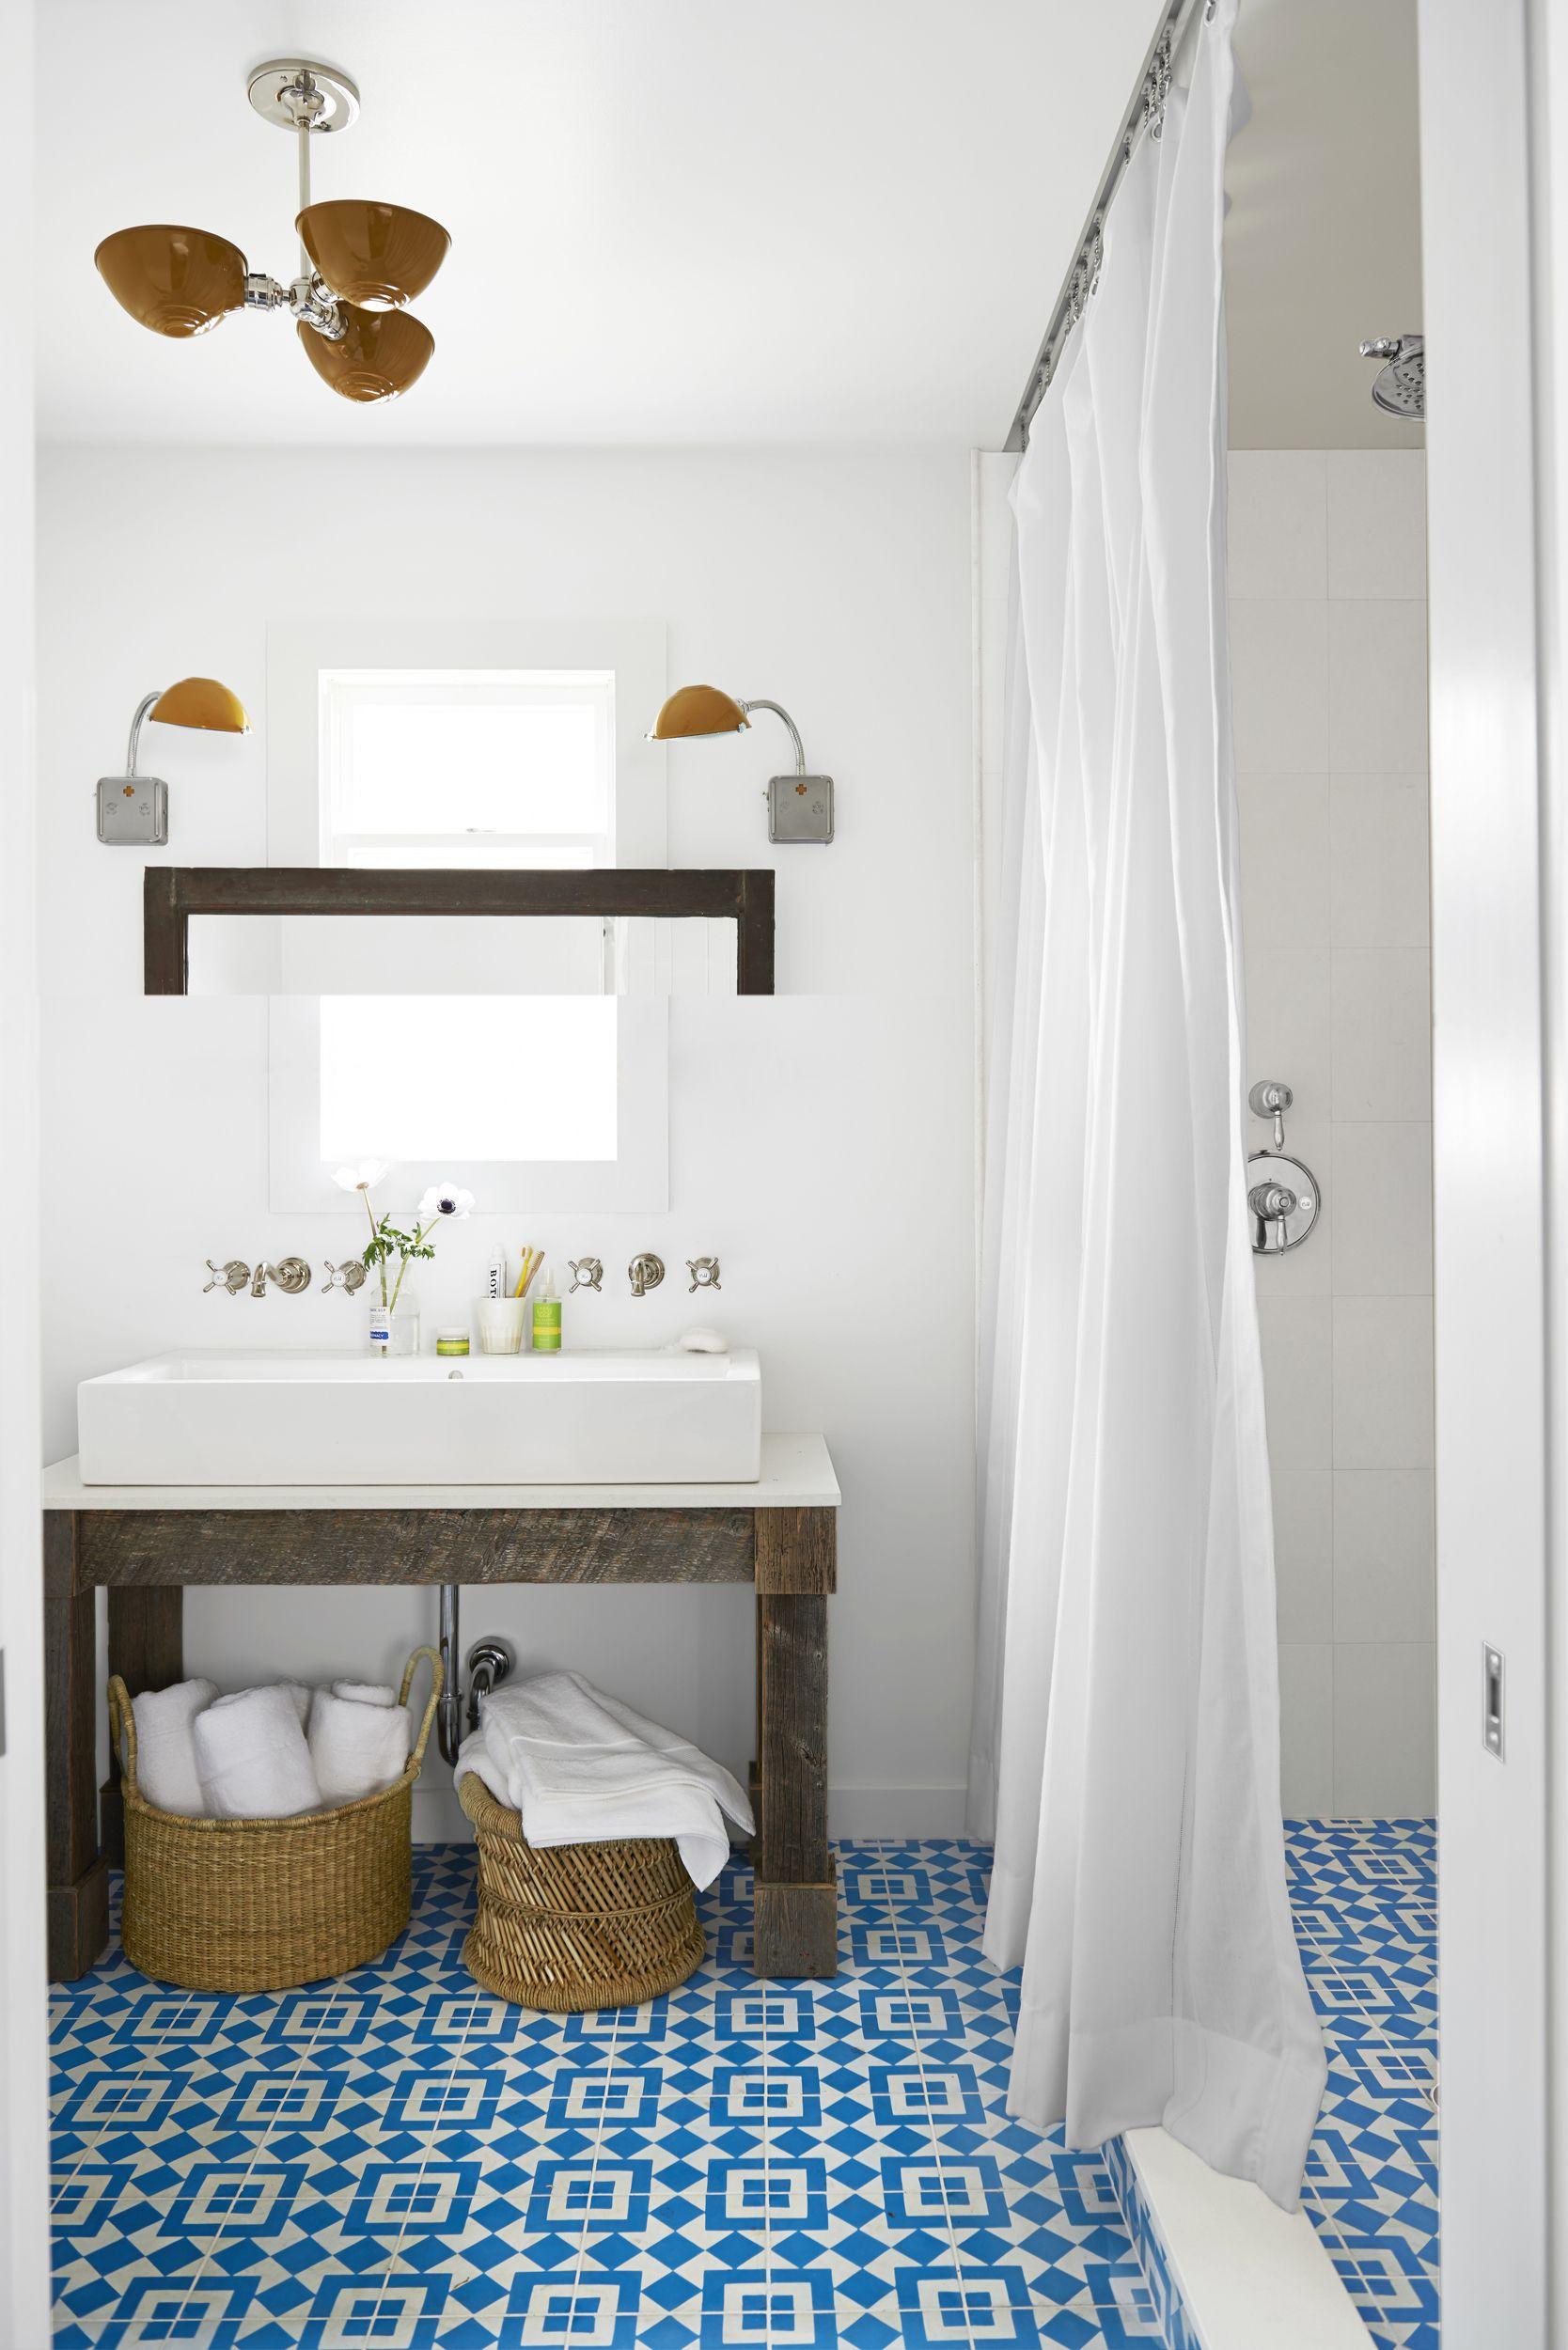 18 small bathroom storage ideas wall storage solutions and shelves rh goodhousekeeping com Bathroom Ideas for Small Spaces Wire Shelves for Small Bathrooms